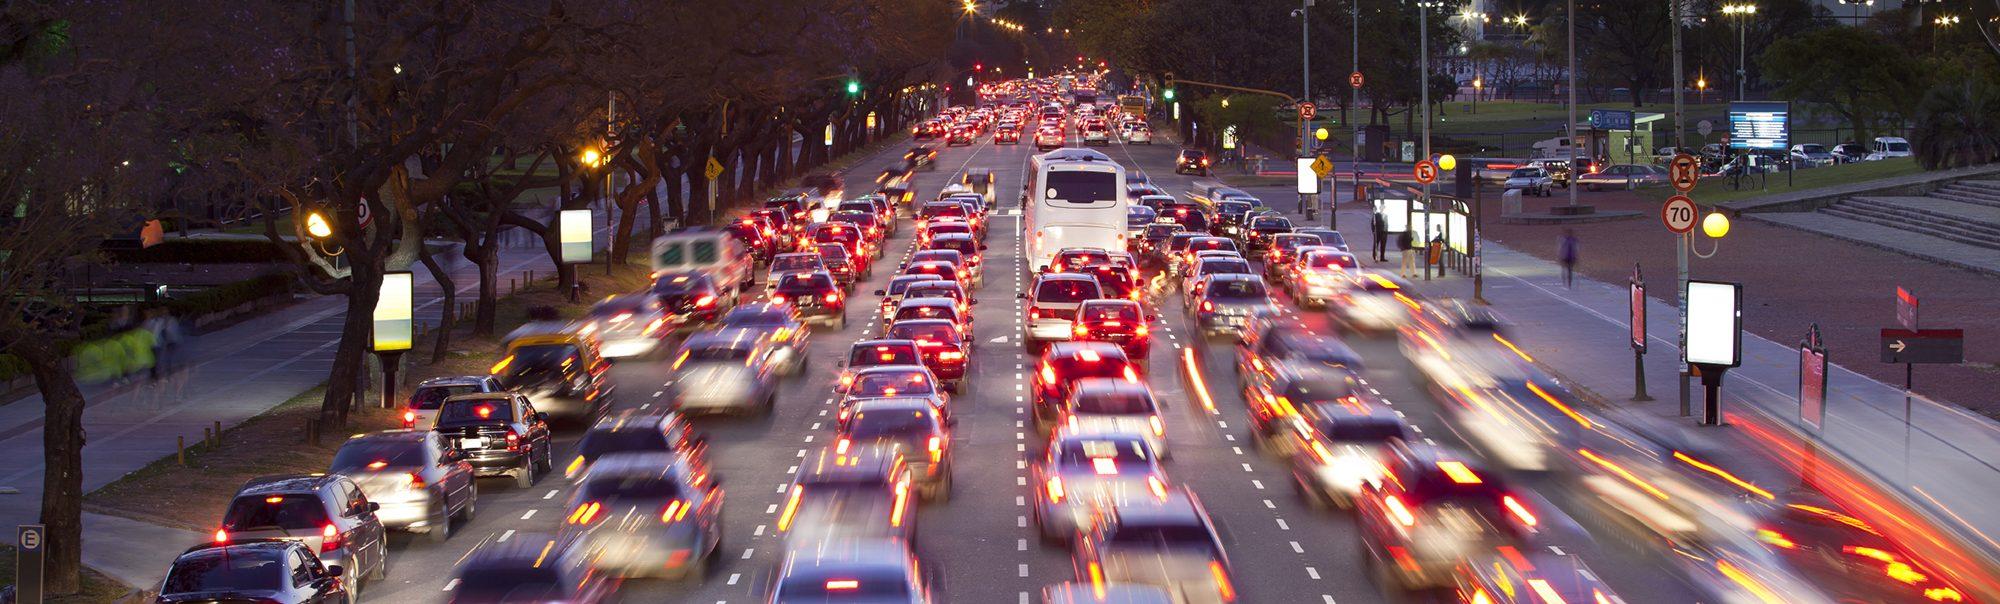 Leddar for intelligent transportation systems